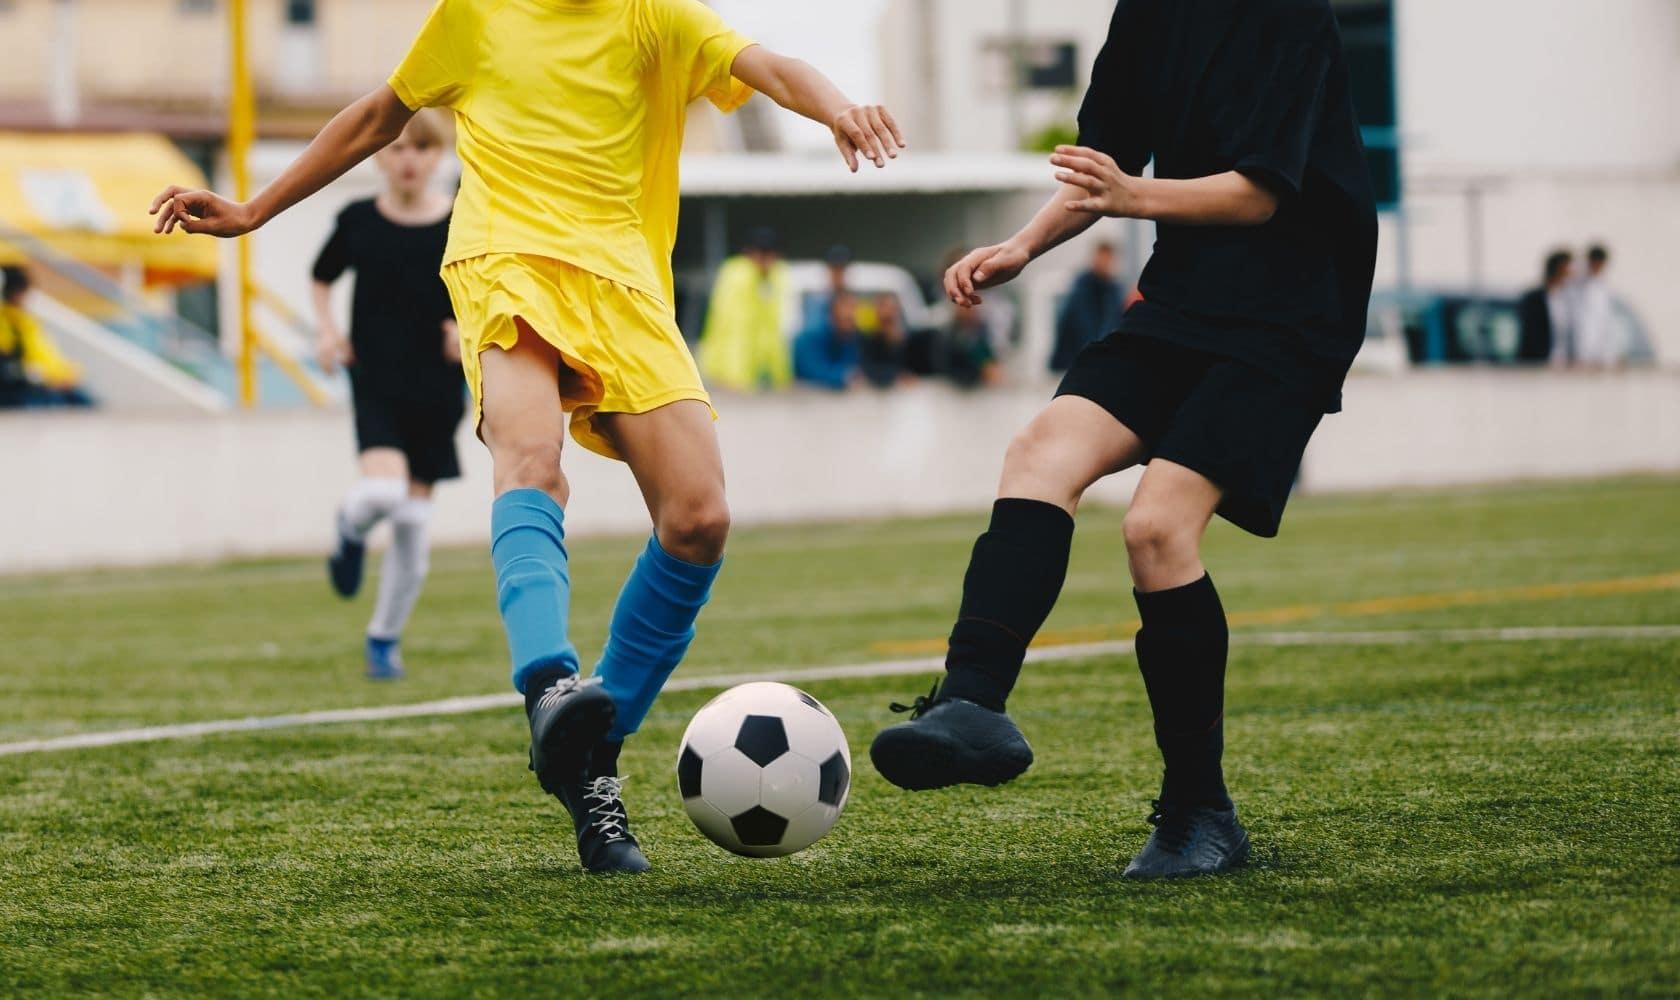 How to coach U12 soccer: read professional coaches explain the best U12 soccer drills.